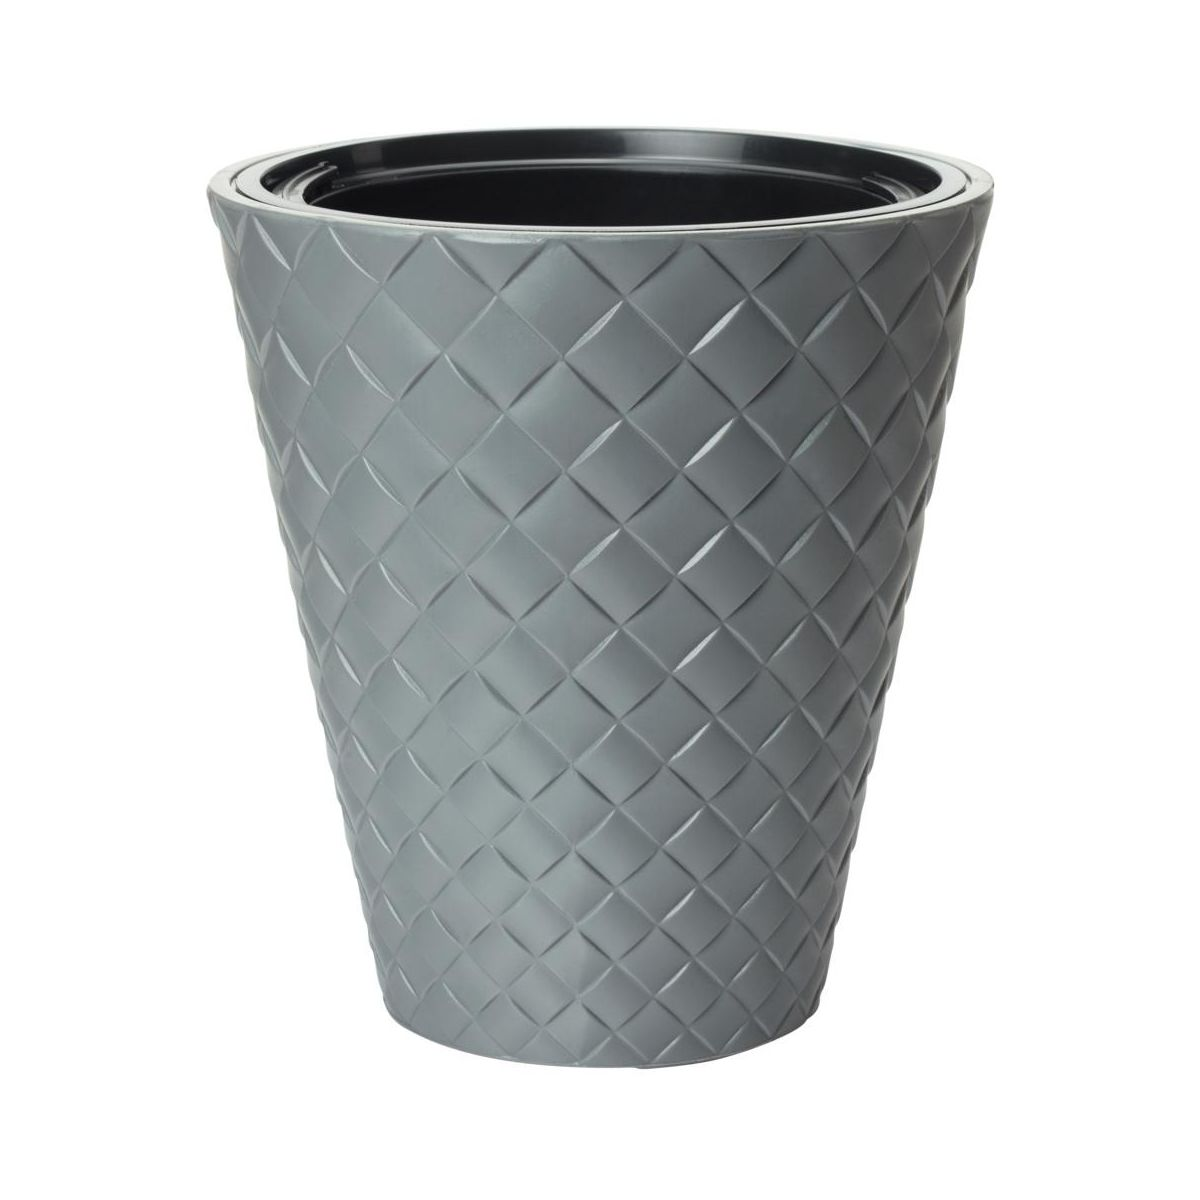 Doniczka plastikowa 29.5 cm szara MAKATA